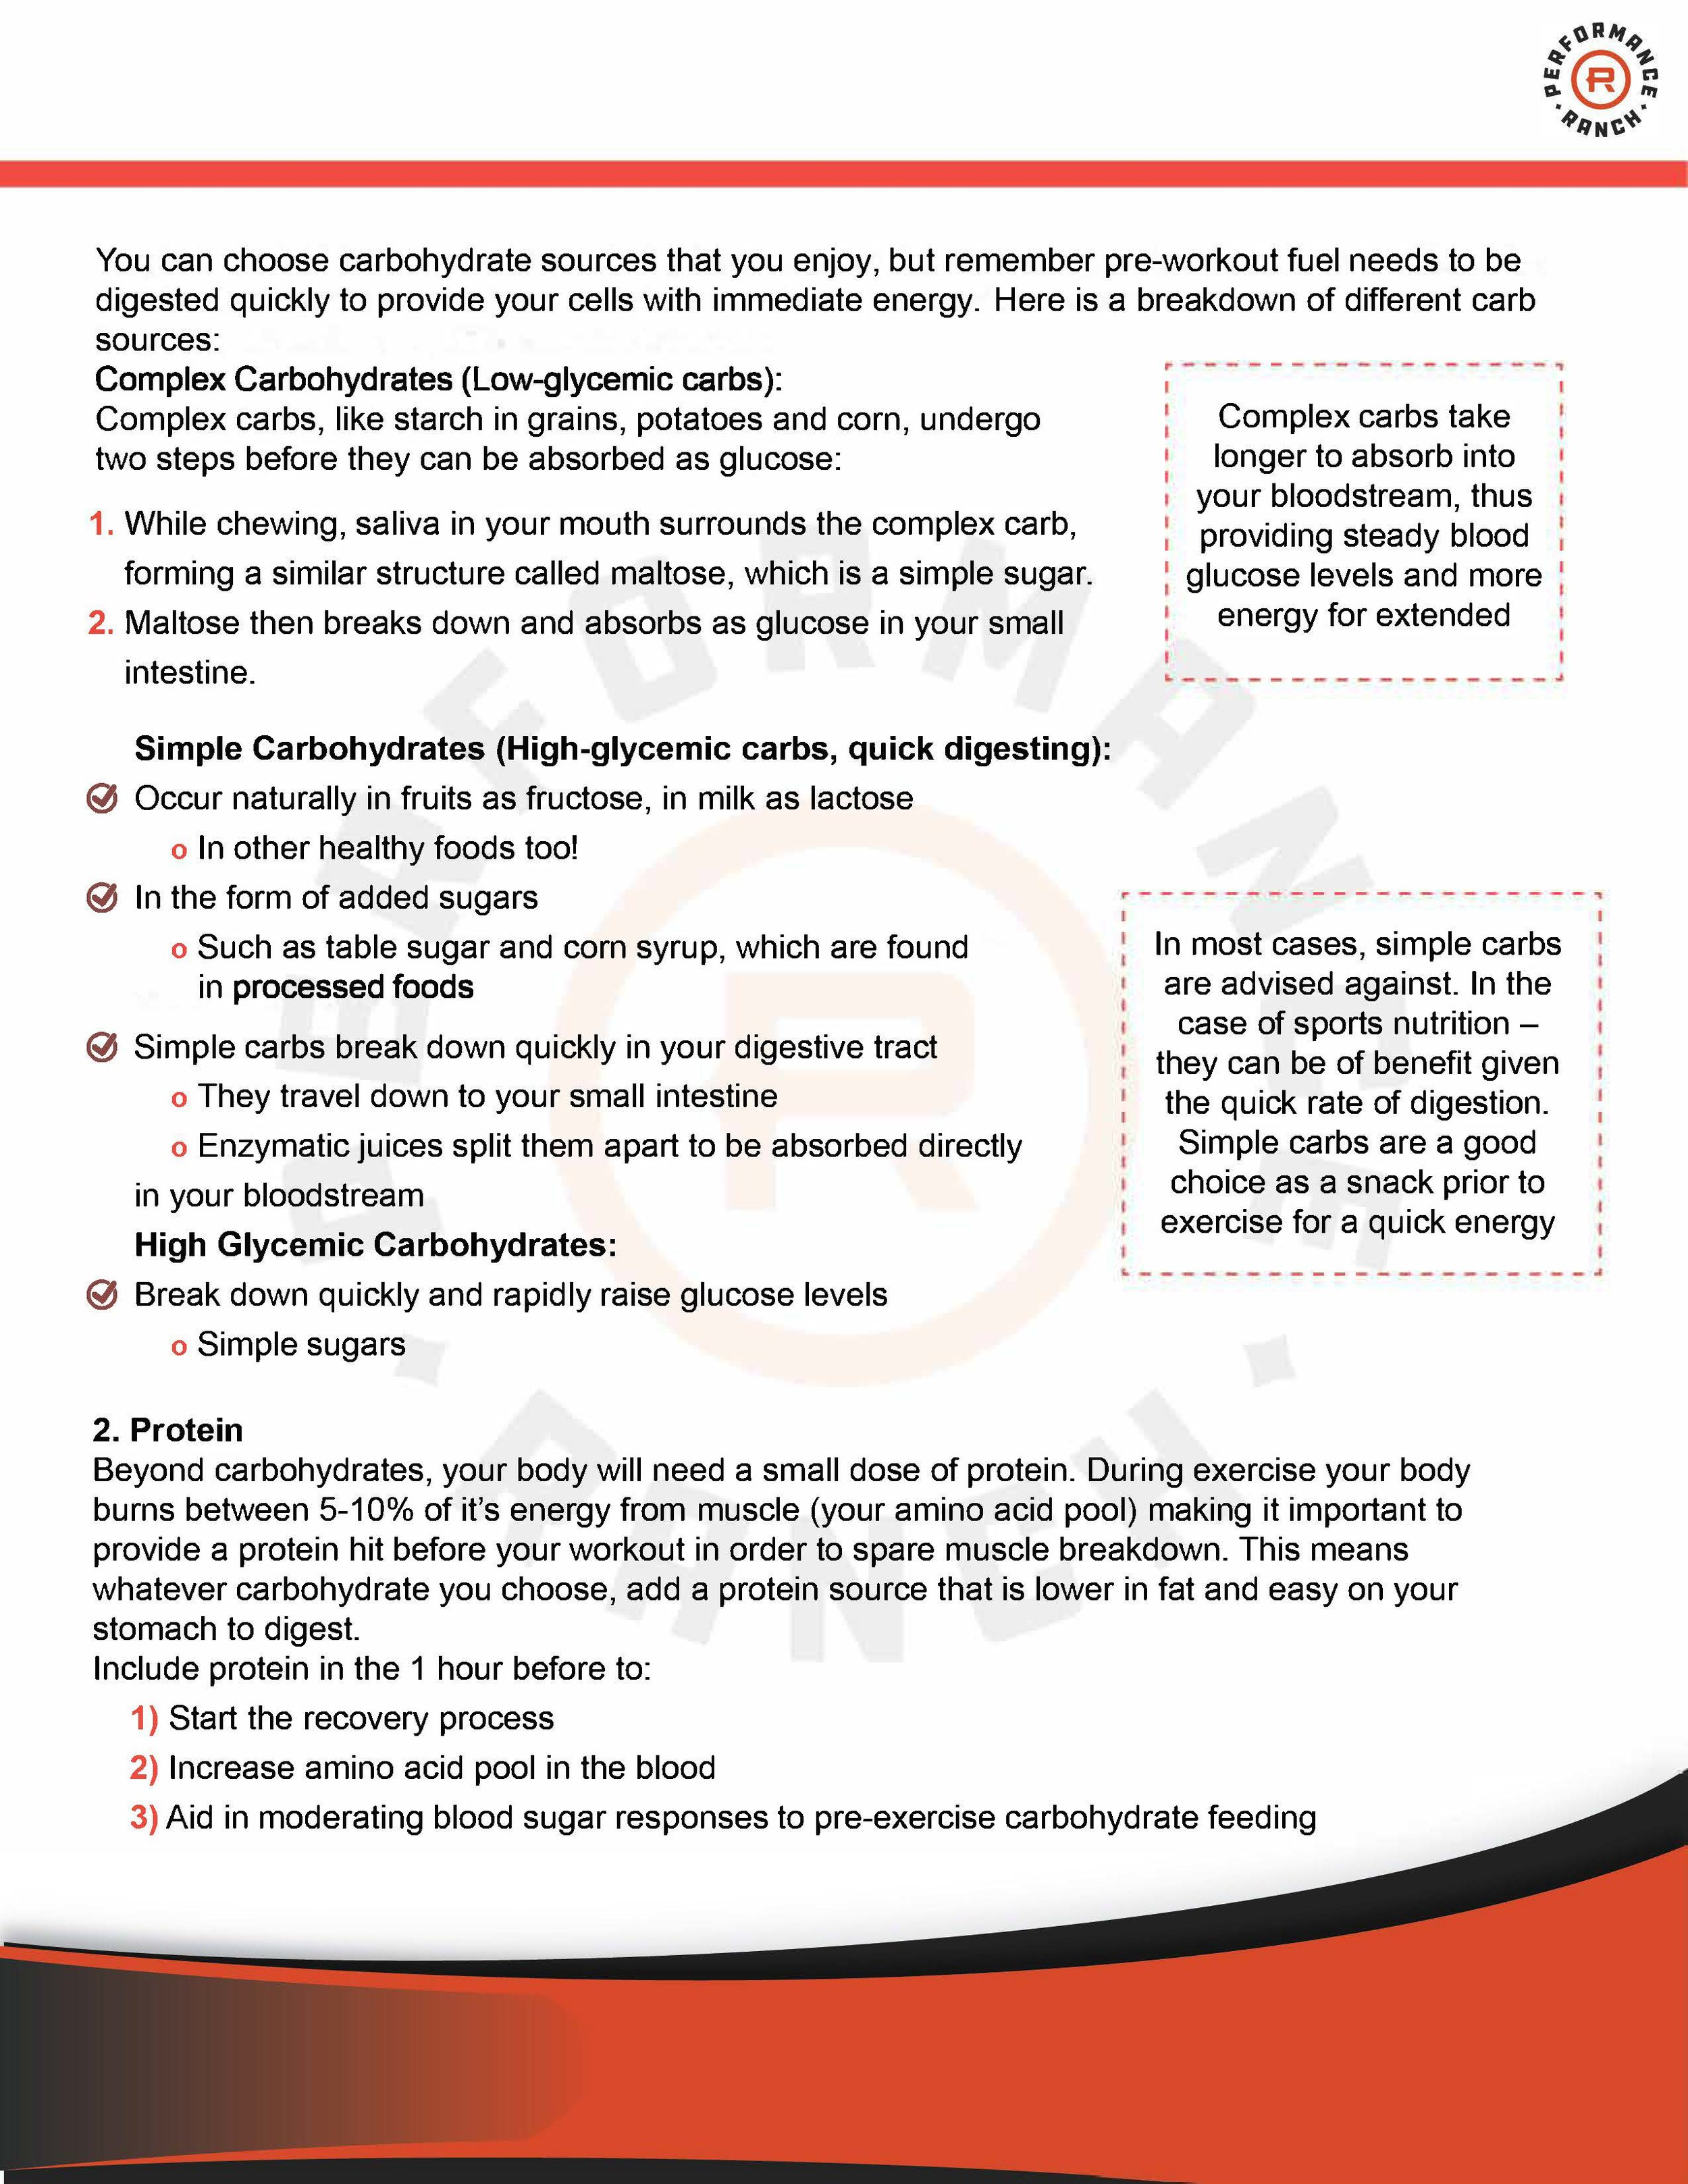 Fuel Plan Education_Page_3.jpg